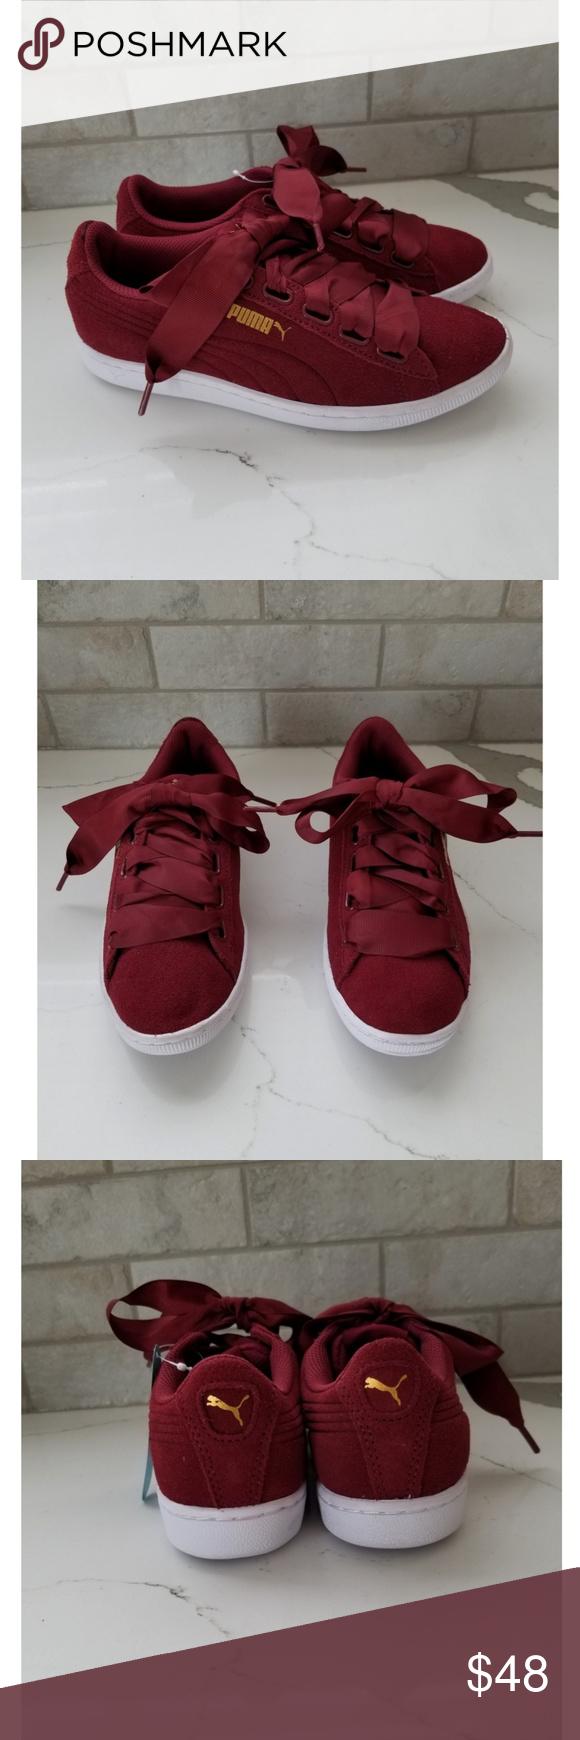 ecc3fc87545e NWT PUMA burgundy ribbon lace suede shoe New...never worn. Still has ...